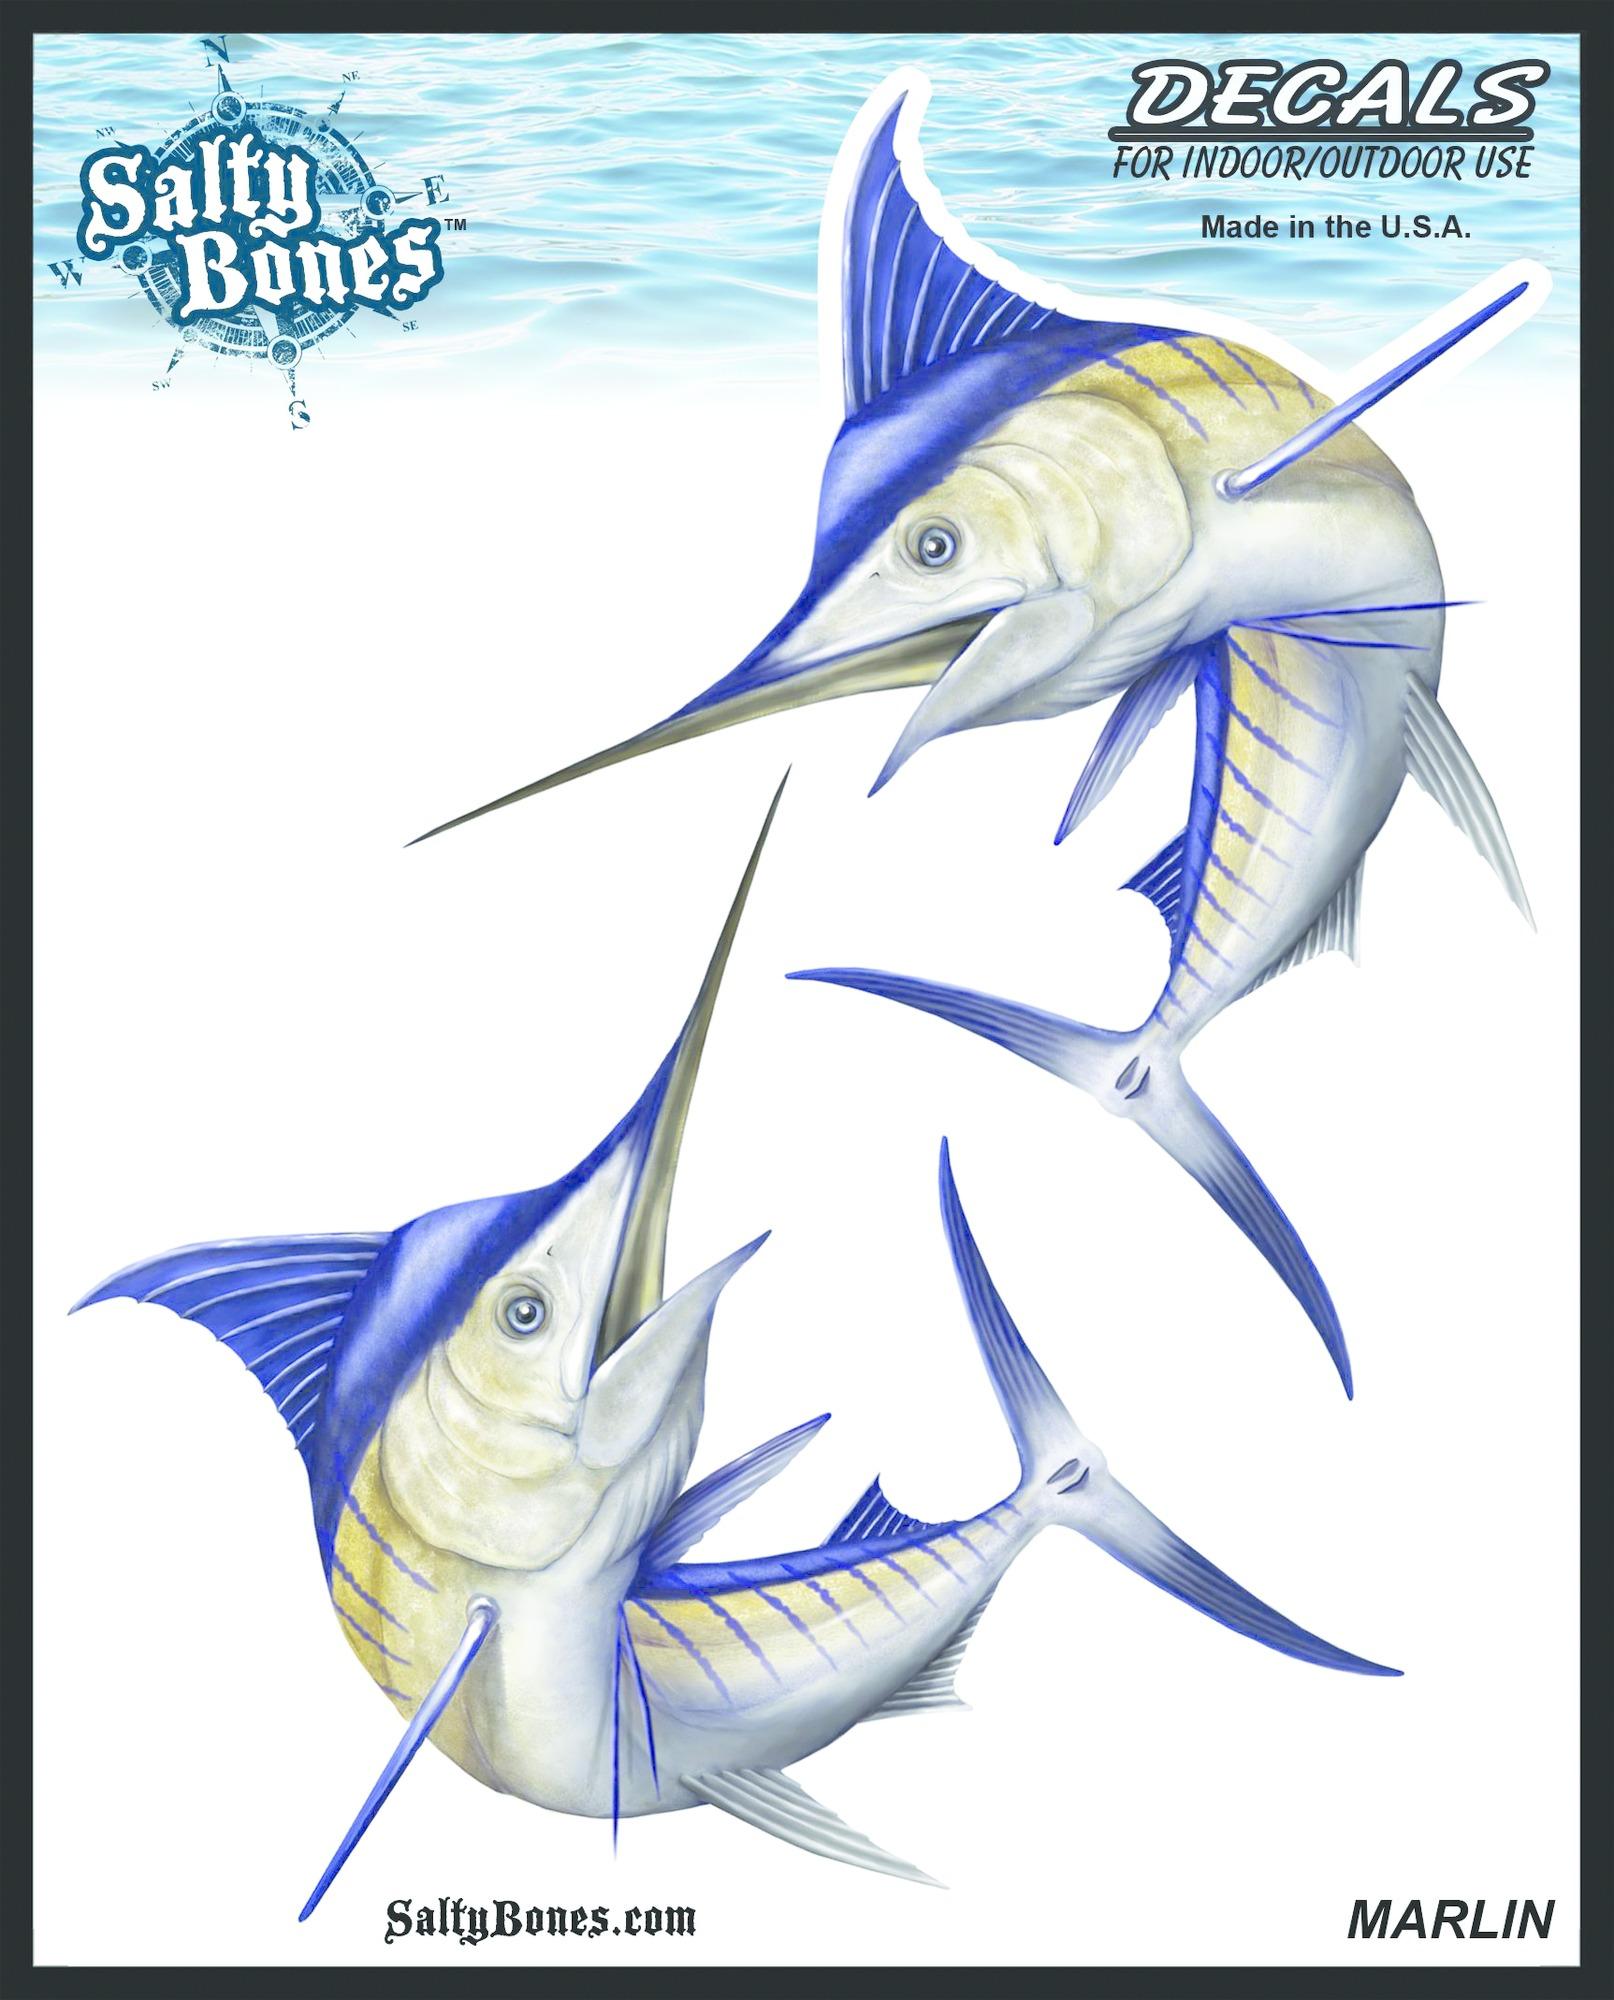 Salty Bones BSD2481 Decal, Double Marlin